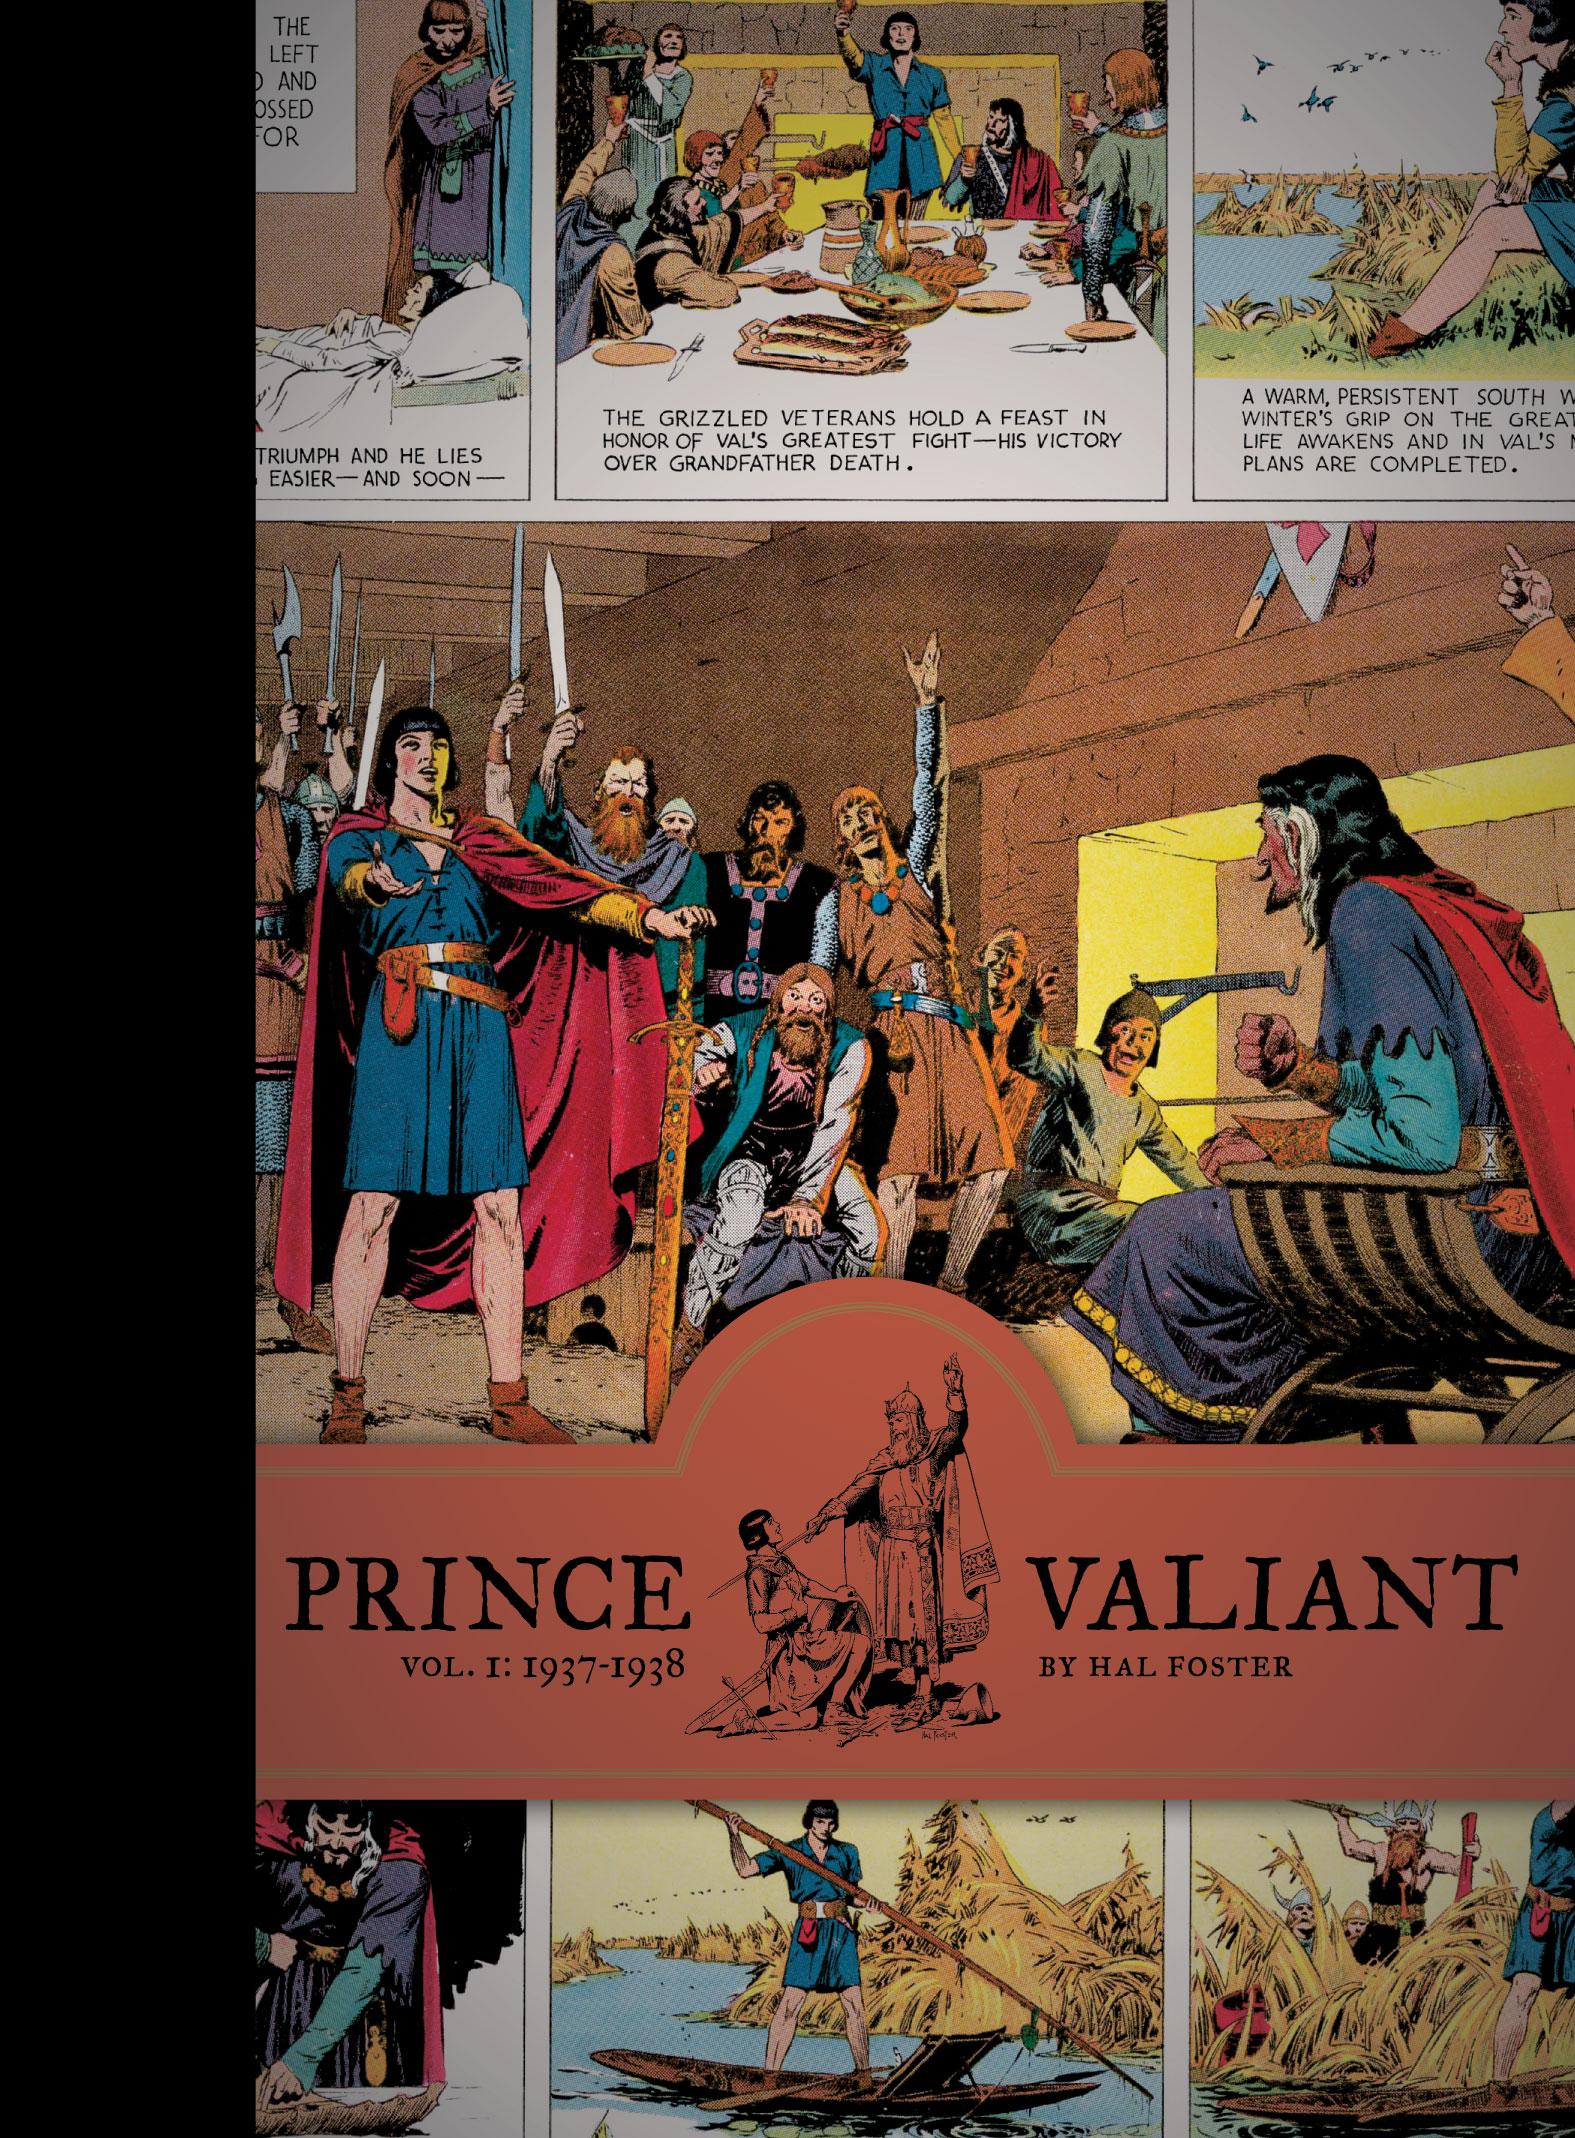 Prince Valiant, Vol. 1: 1937-1938